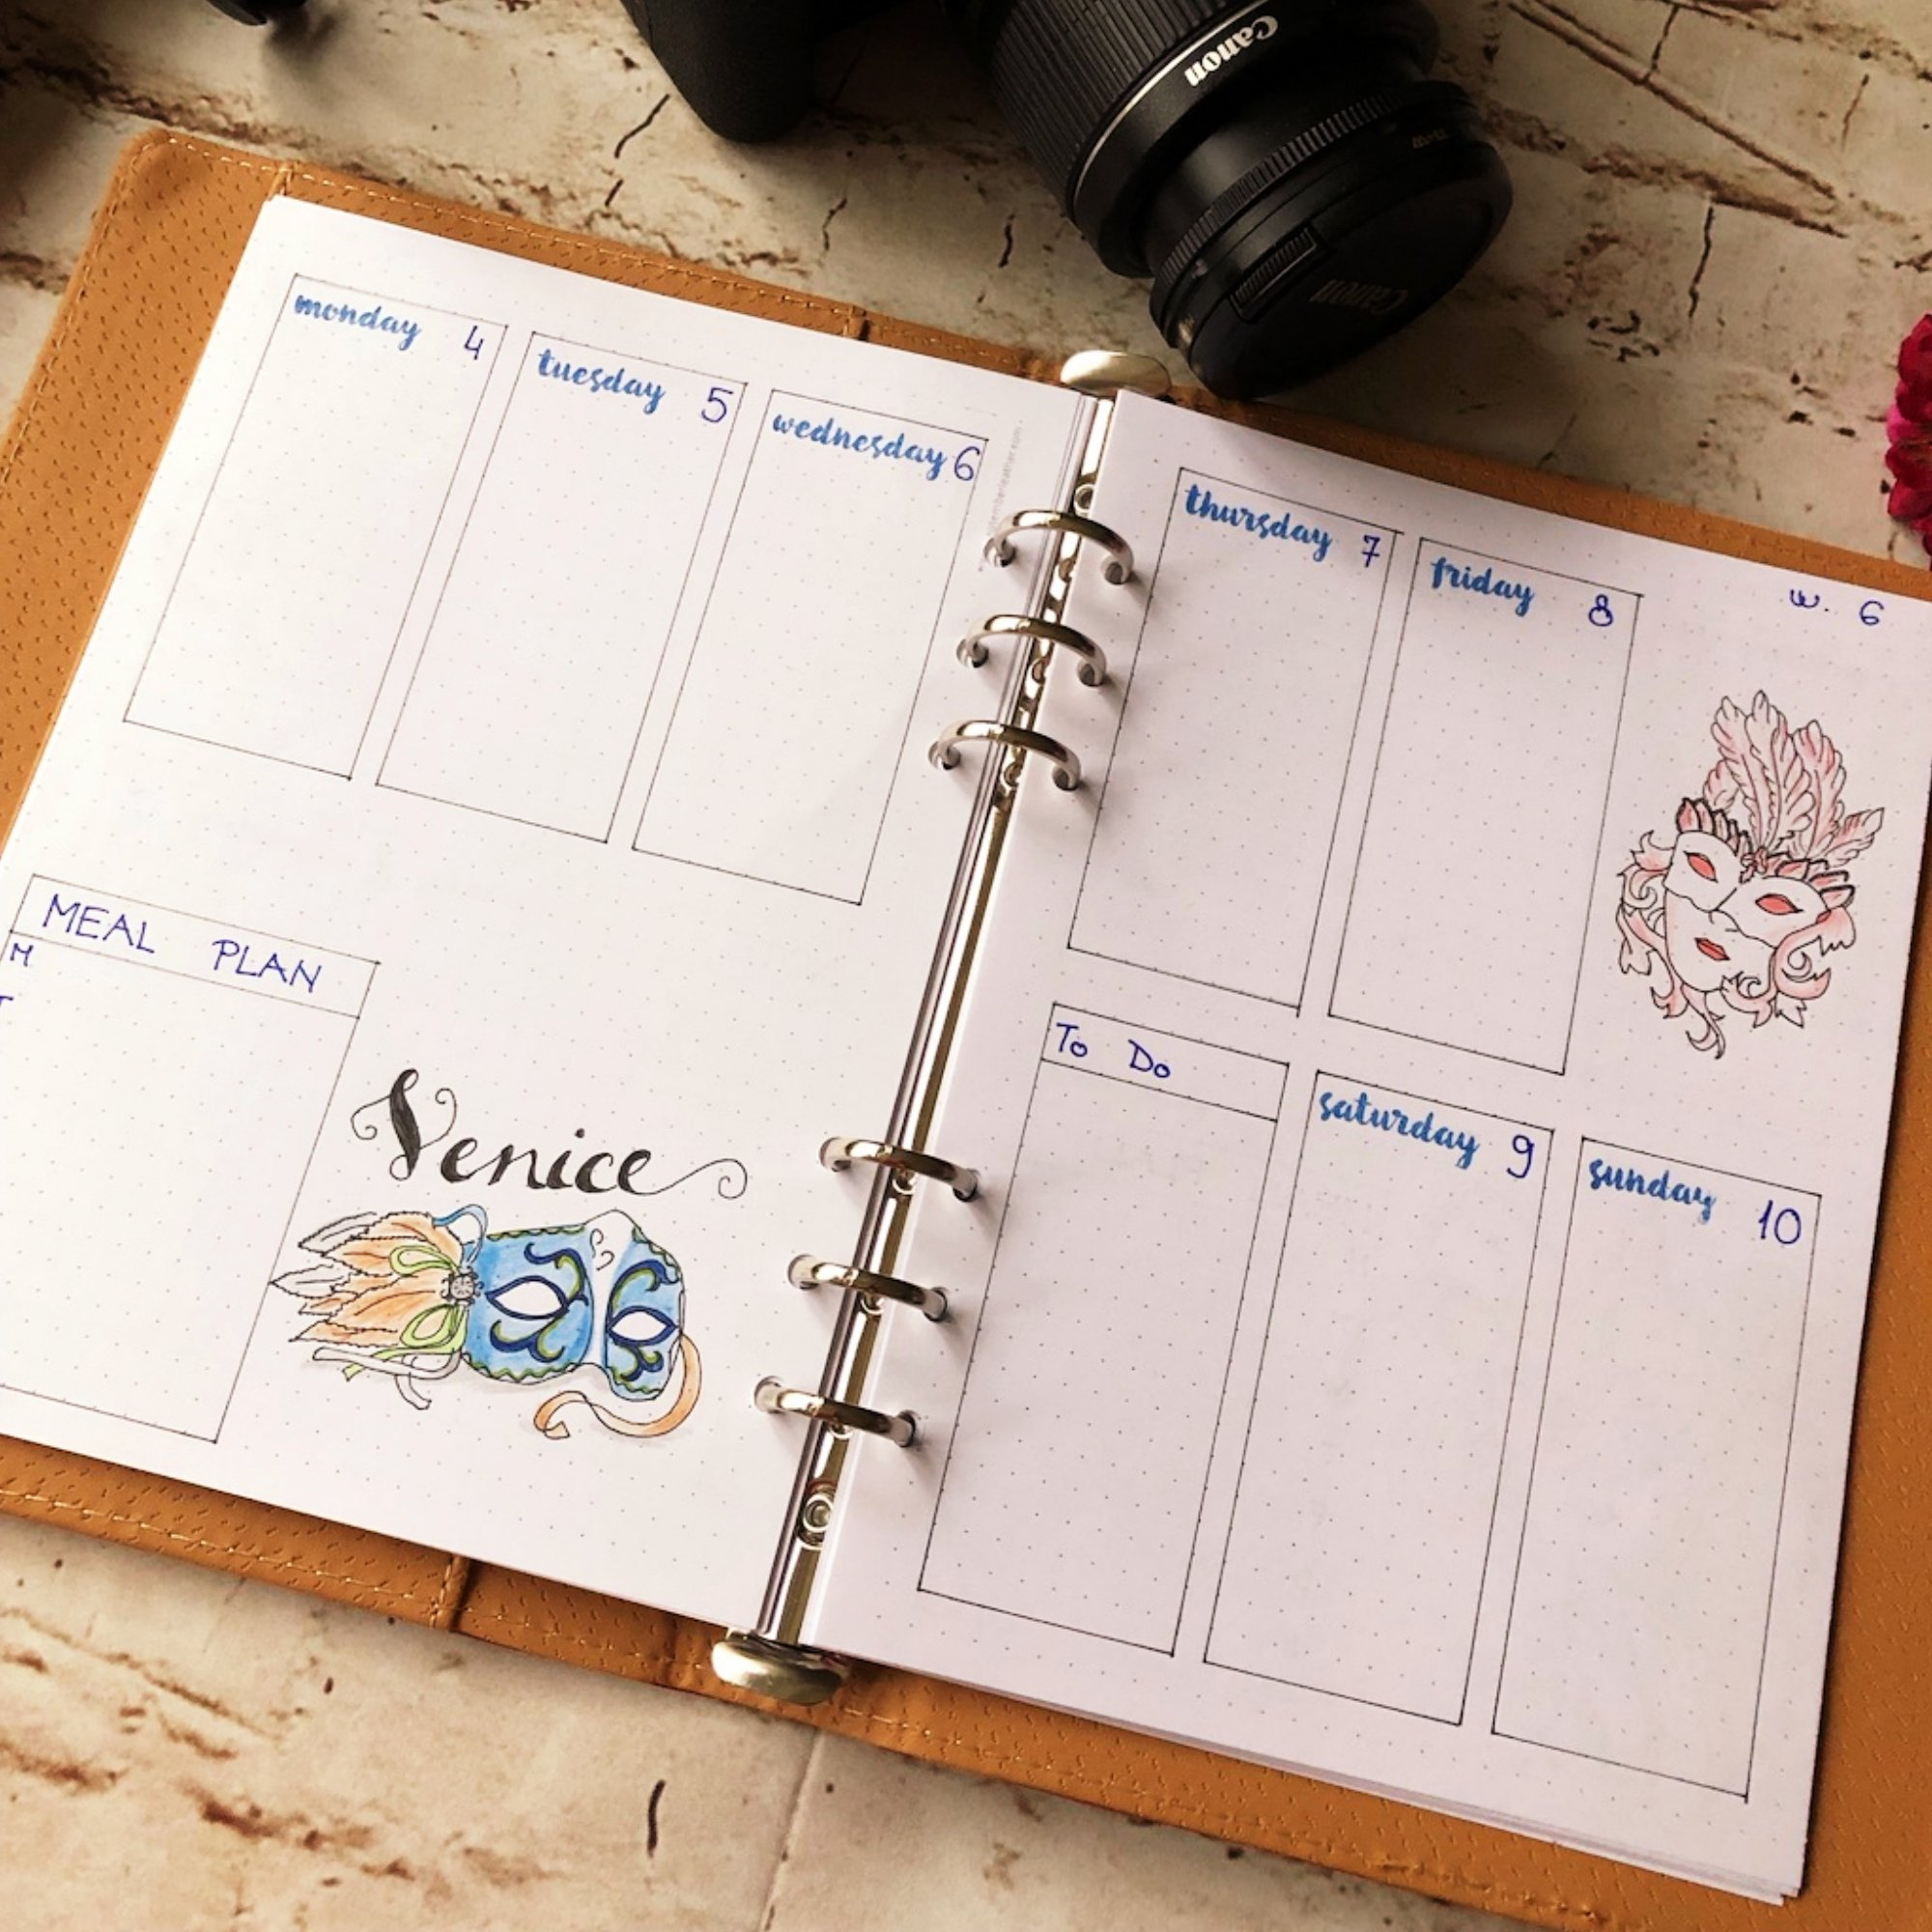 Creative journaling weekly planner - week 6 - itstartswithacoffee.com #creativejournaling #bulletjournaling #planner #weeklyplanner #weekly #February #2019 #week6